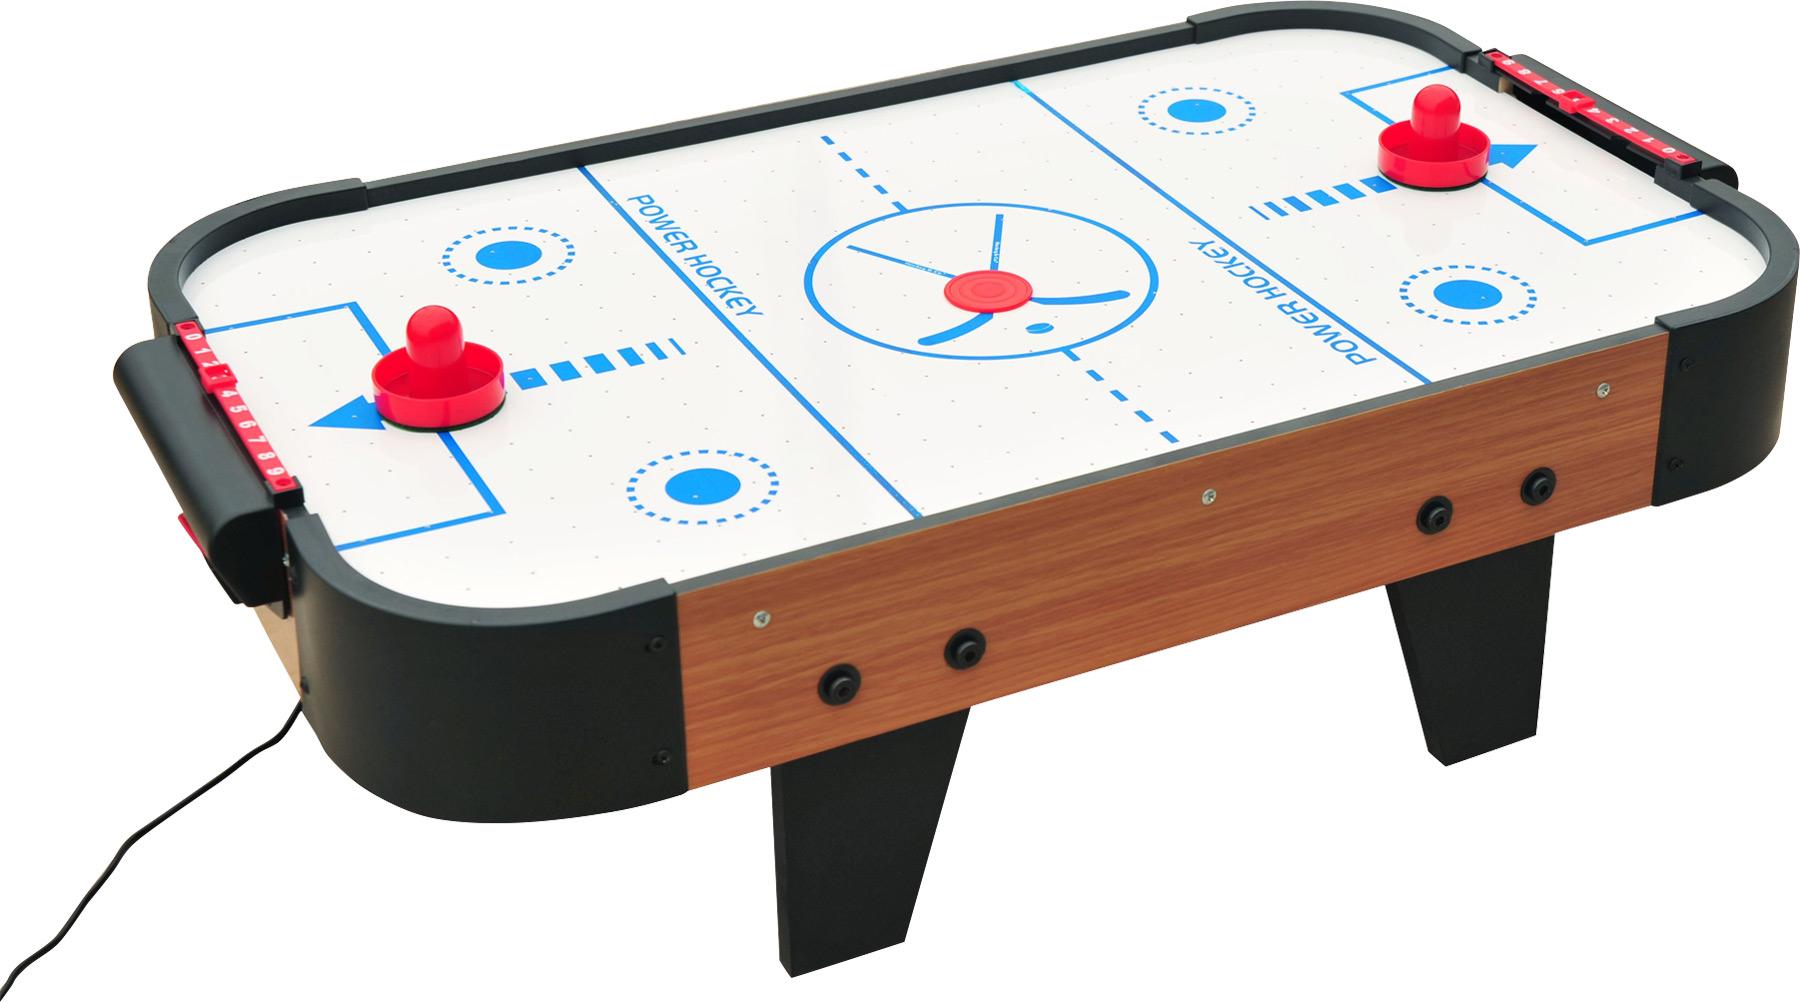 Small Foot Stolní Air Hockey vzdušný hokejový stůl